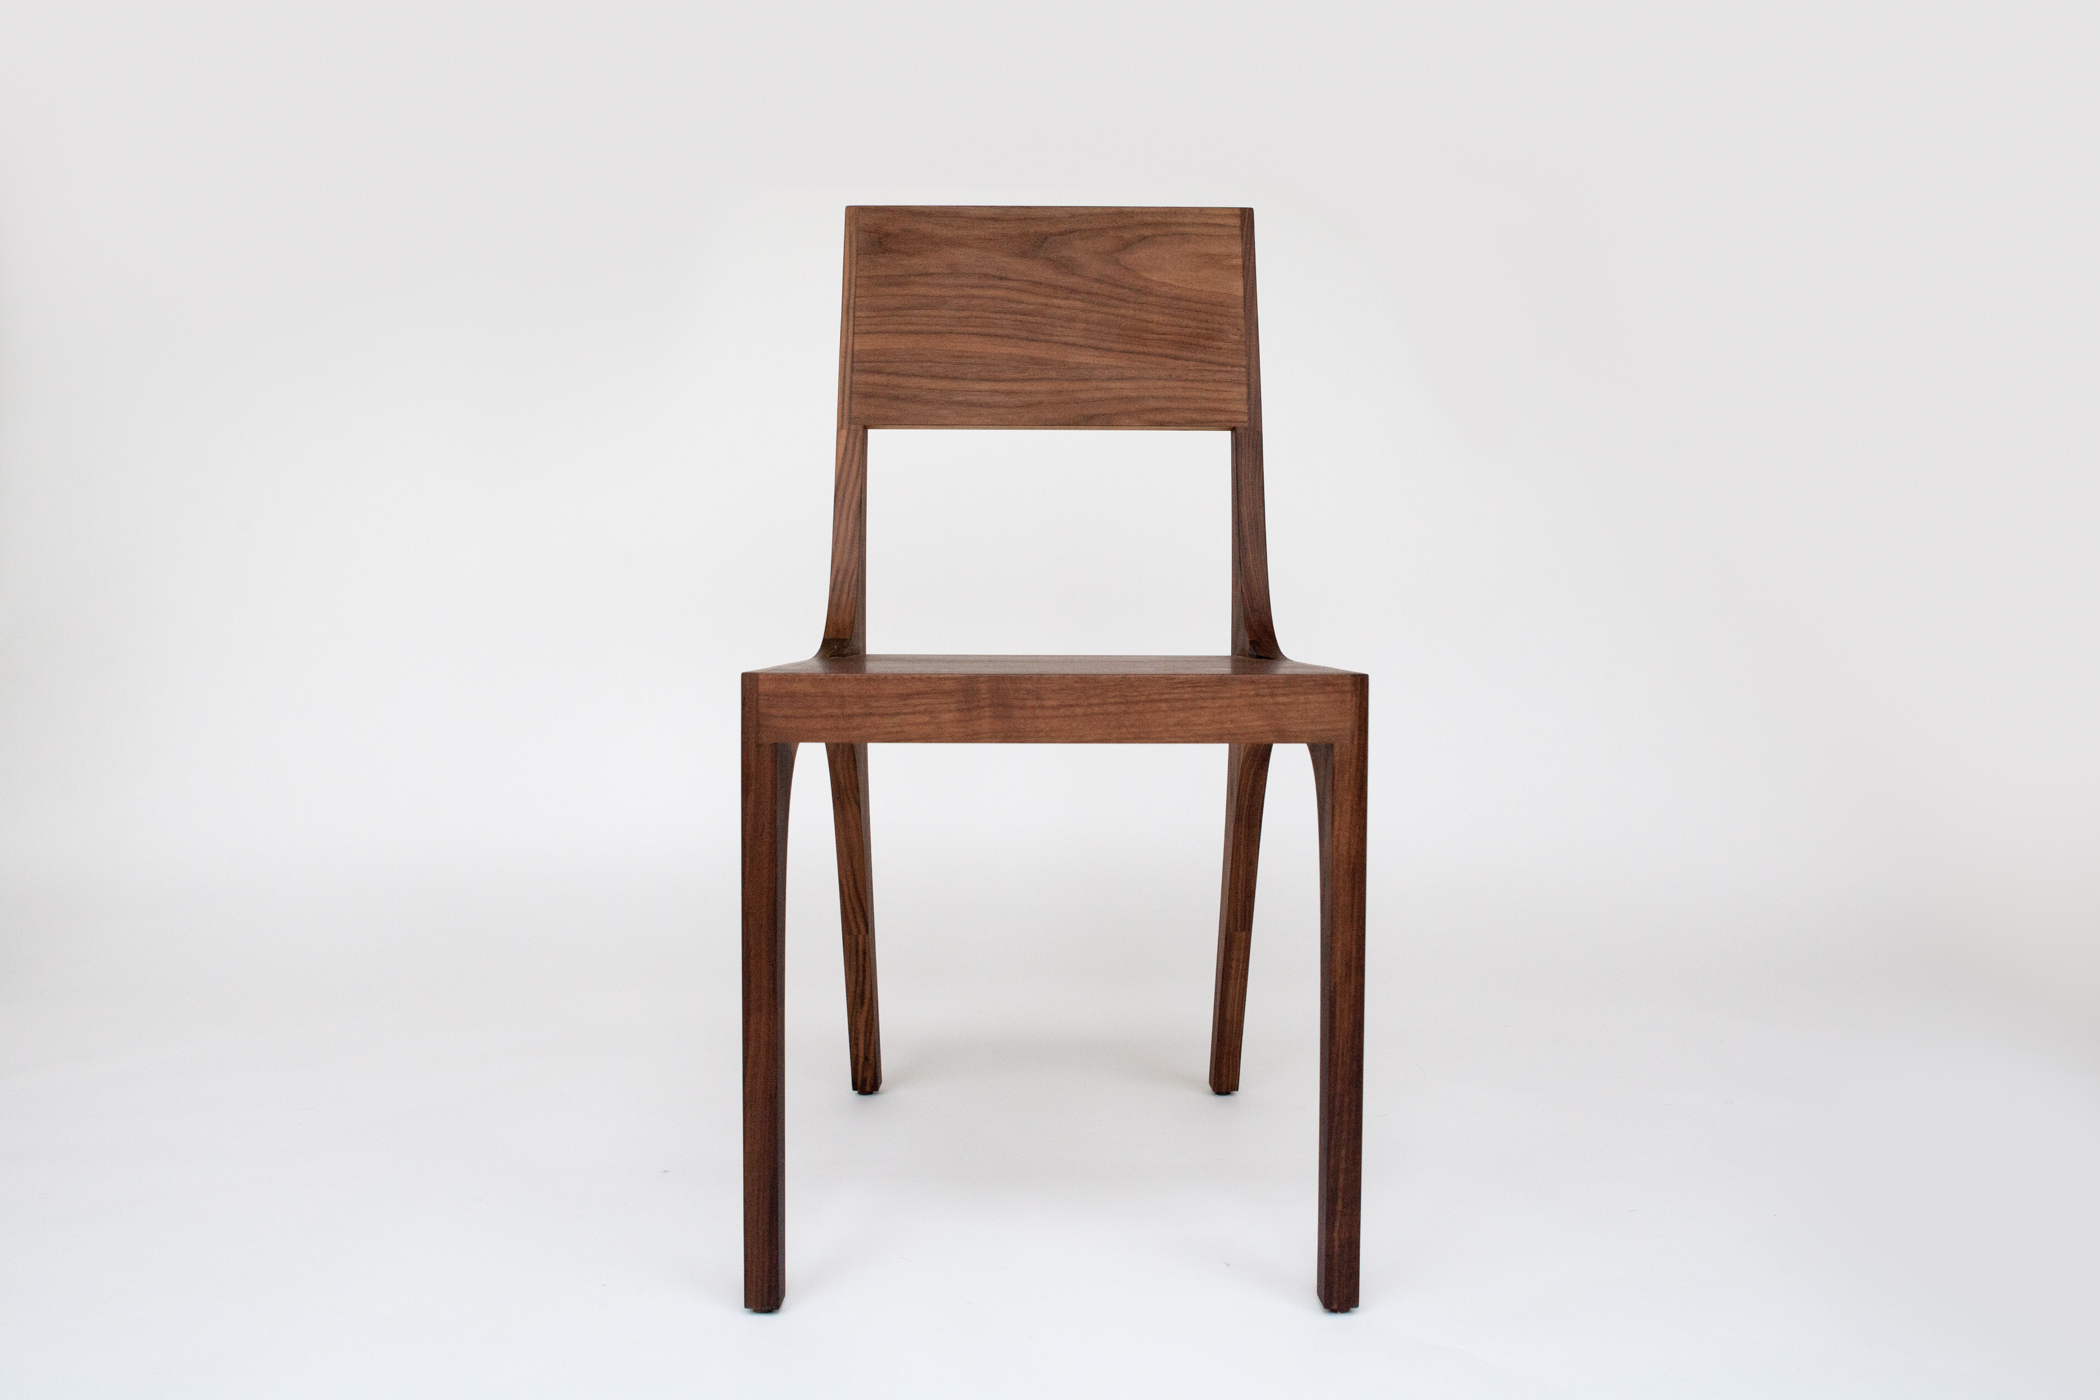 Isometric Chair in Black Walnut